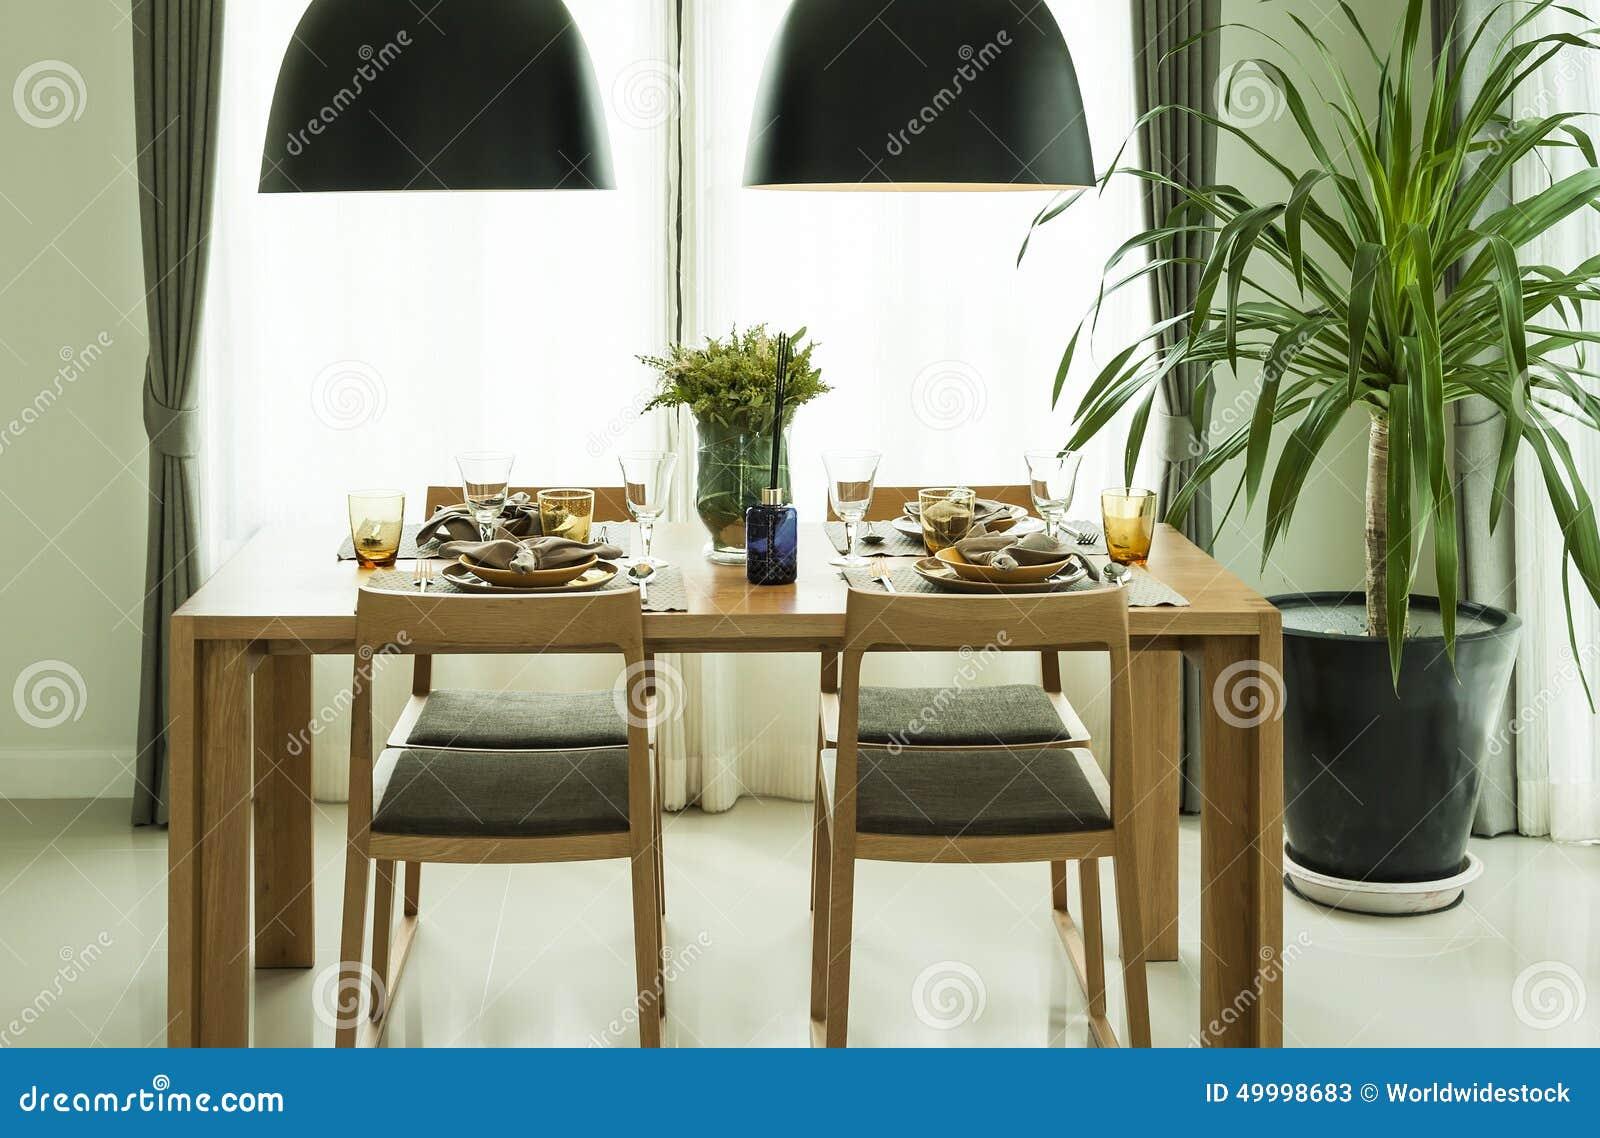 Chaise de salle a manger moderne for Tables et chaises salle a manger